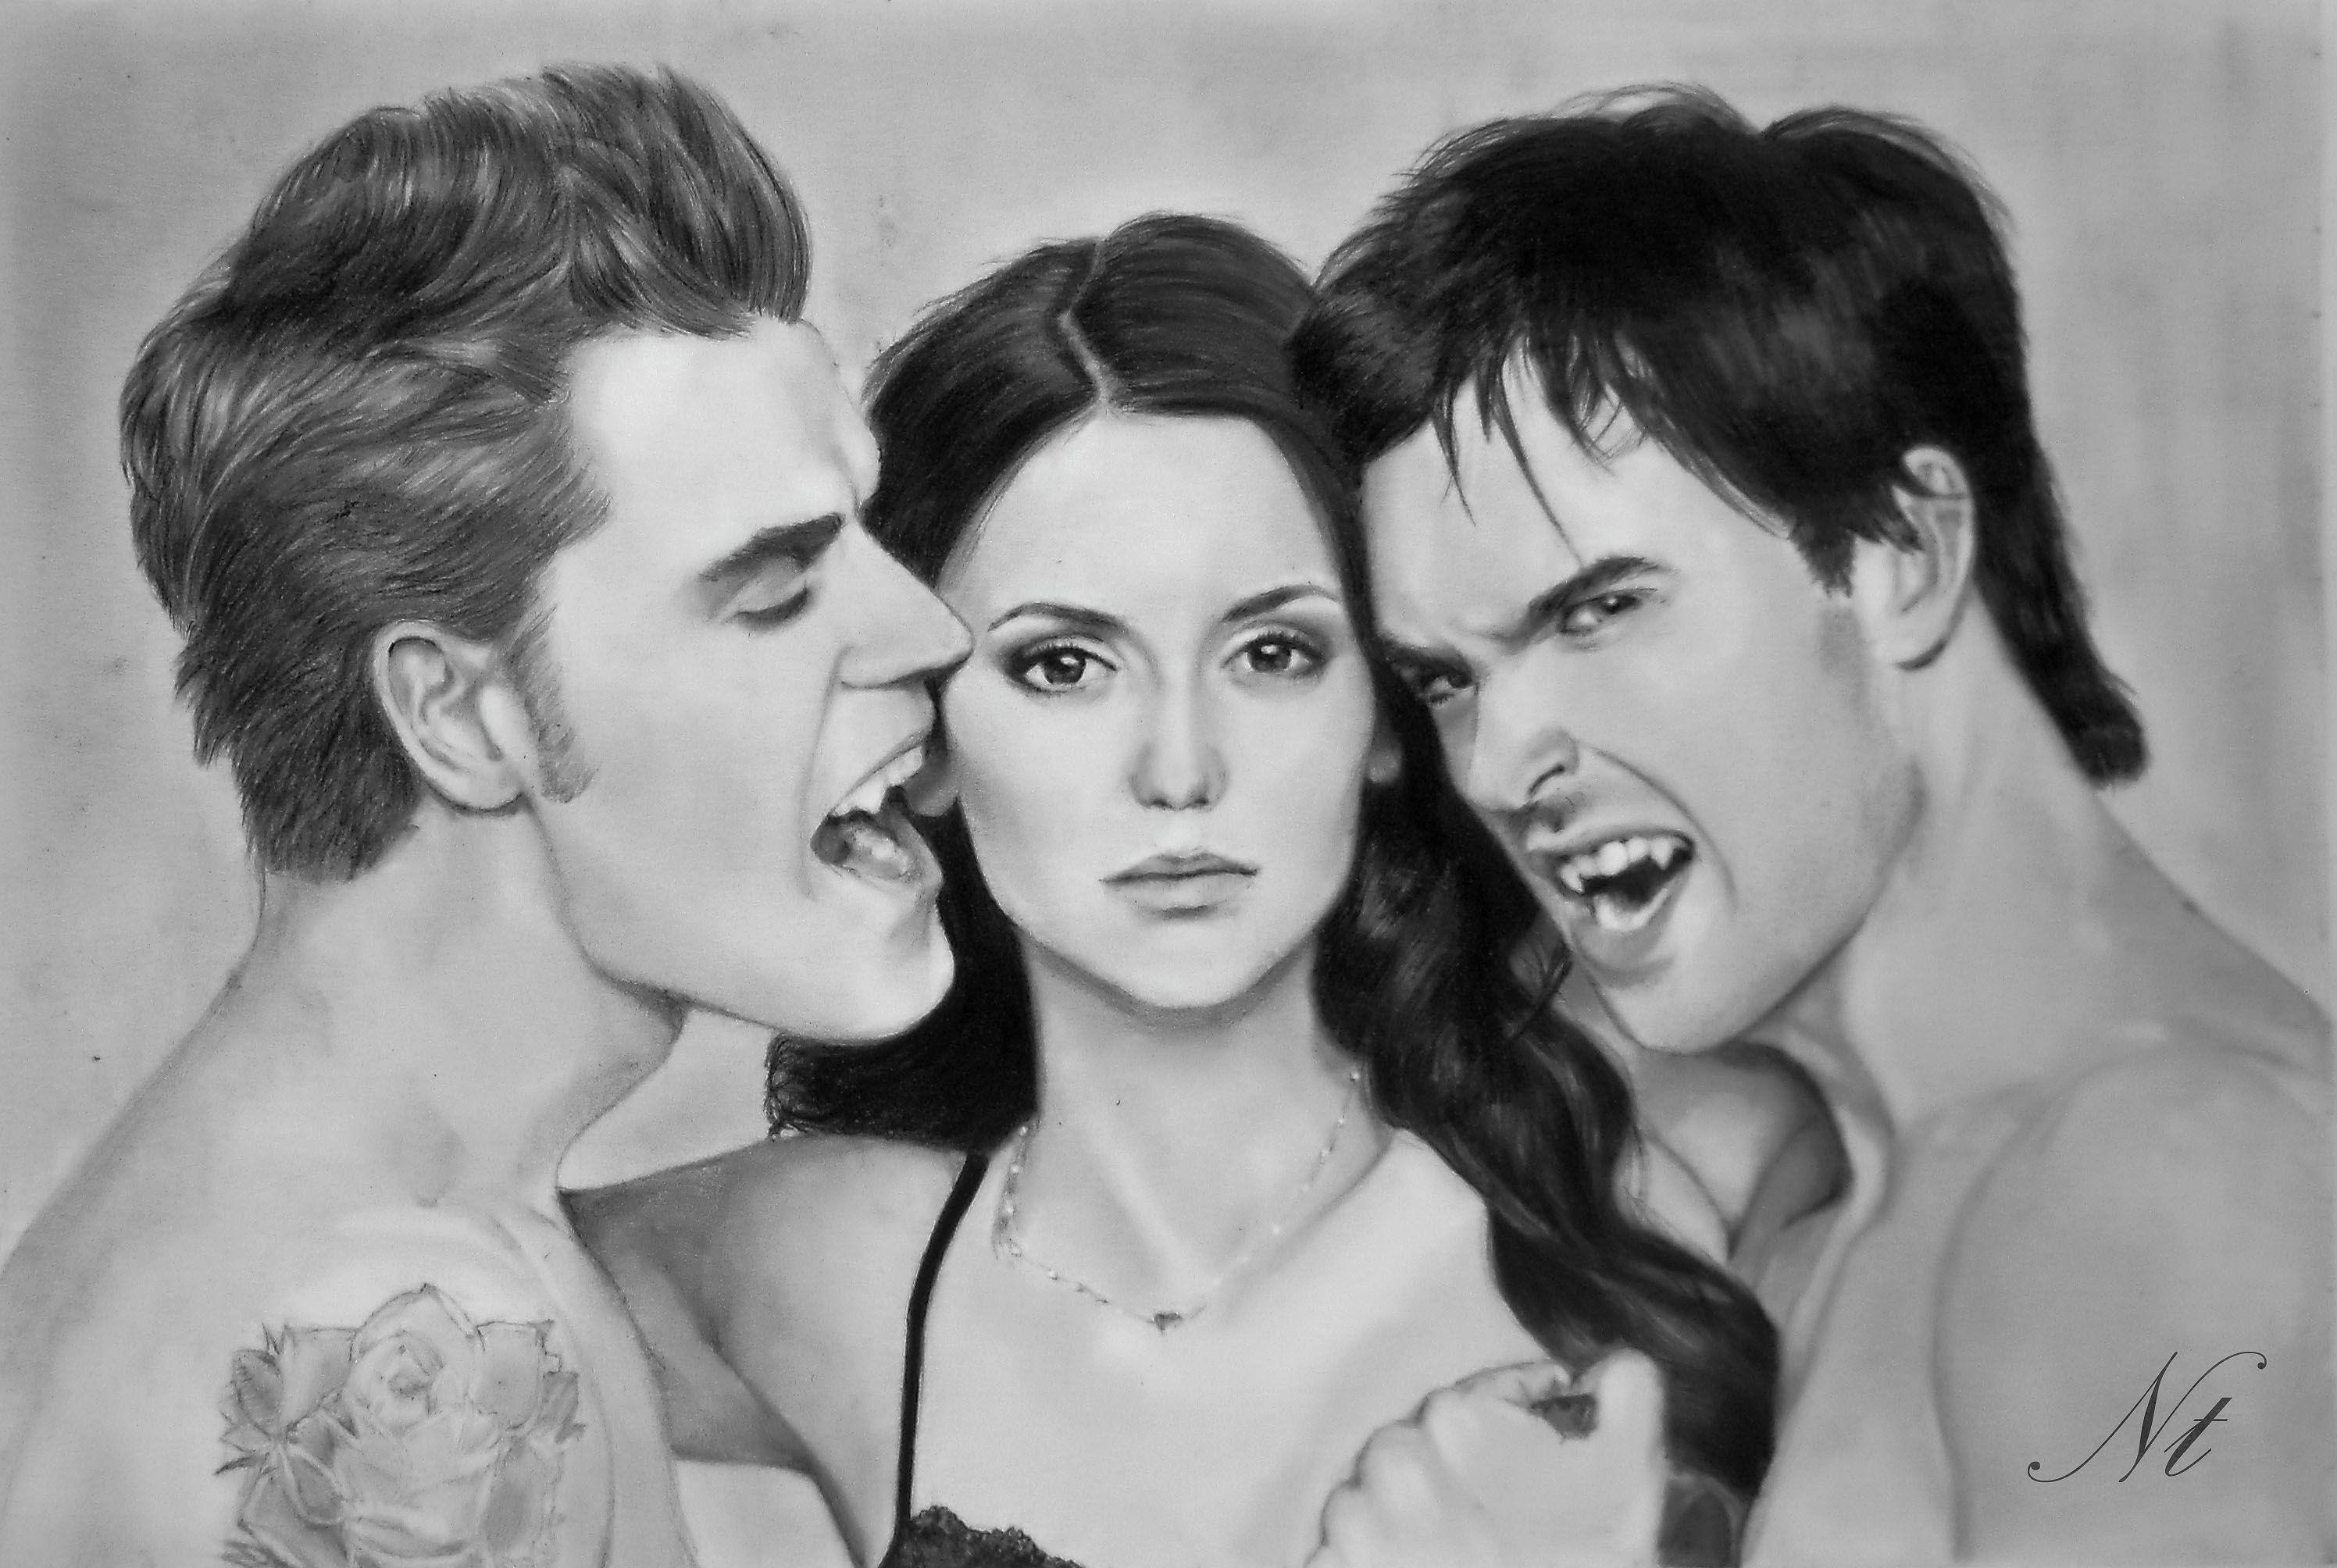 The Vampire Diaries By Natlina On Deviantart Vampire Drawings Vampire Diaries Vampire Diaries Poster